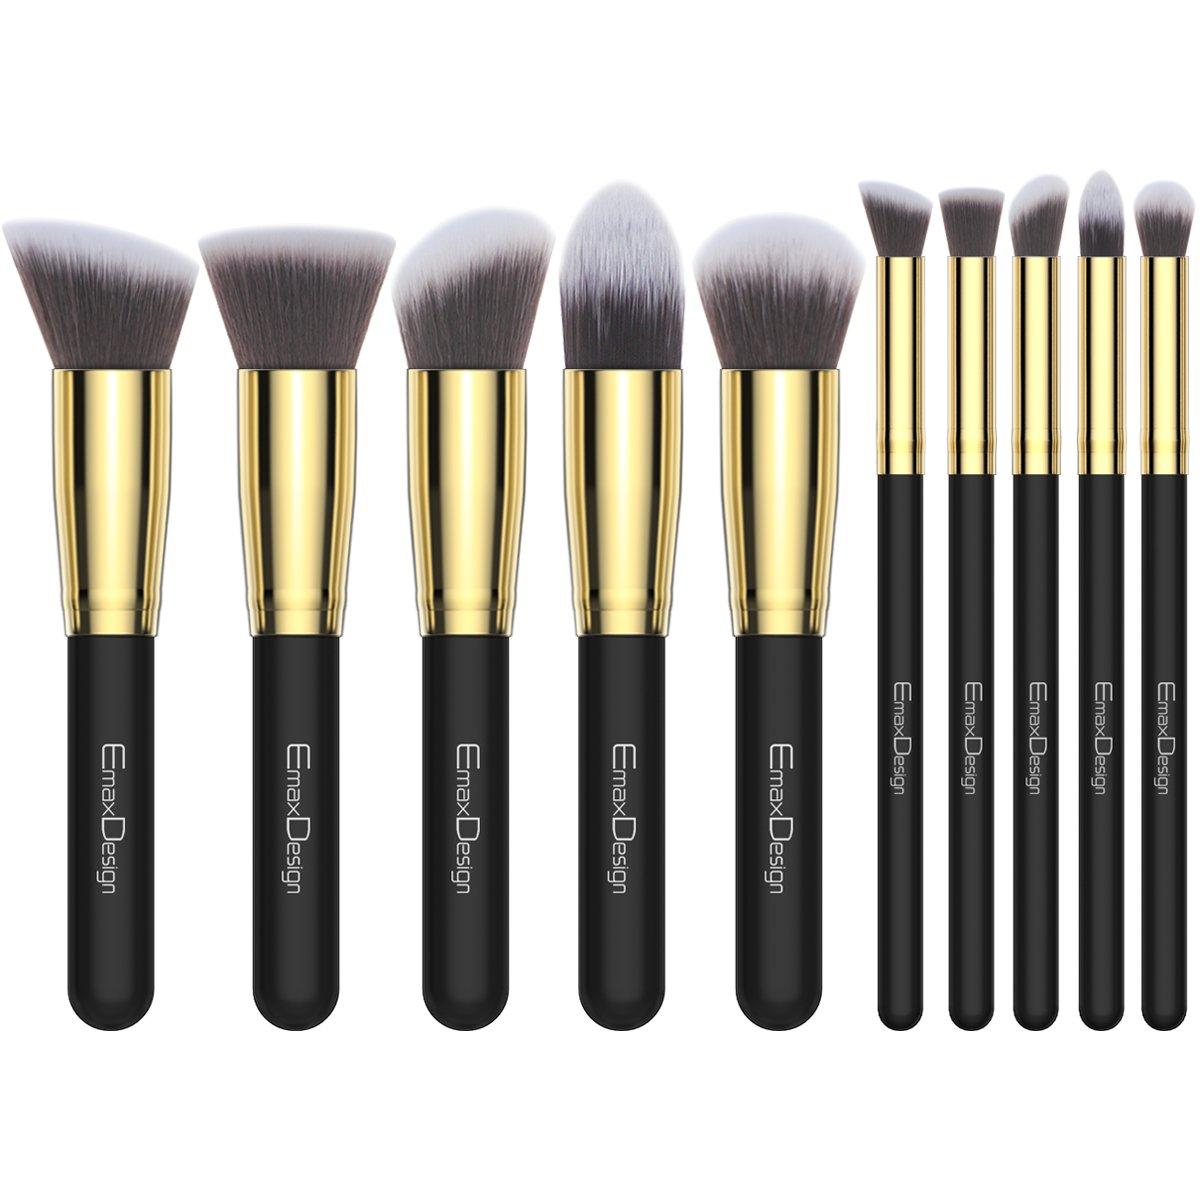 EmaxDesign Makeup Brushes 10 Pieces Professional Makeup Brush Set Synthetic Foundation Blending Concealer Eye Face Liquid Powder Cream Cosmetics Brushes Set (Golden Black)